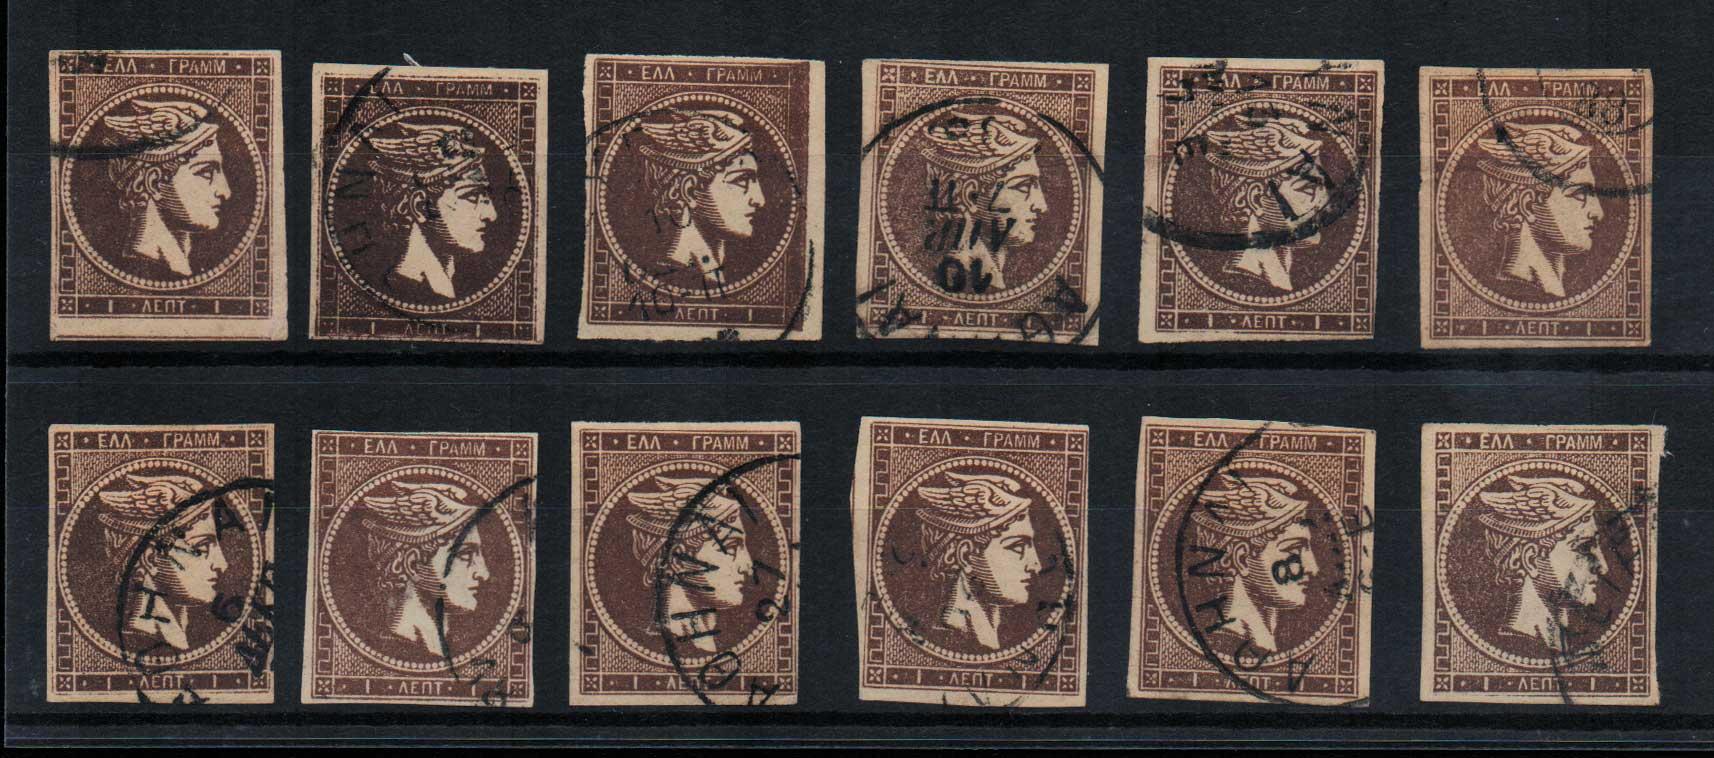 Lot 17 - -  LARGE HERMES HEAD large hermes head -  Athens Auctions Public Auction 70 General Stamp Sale